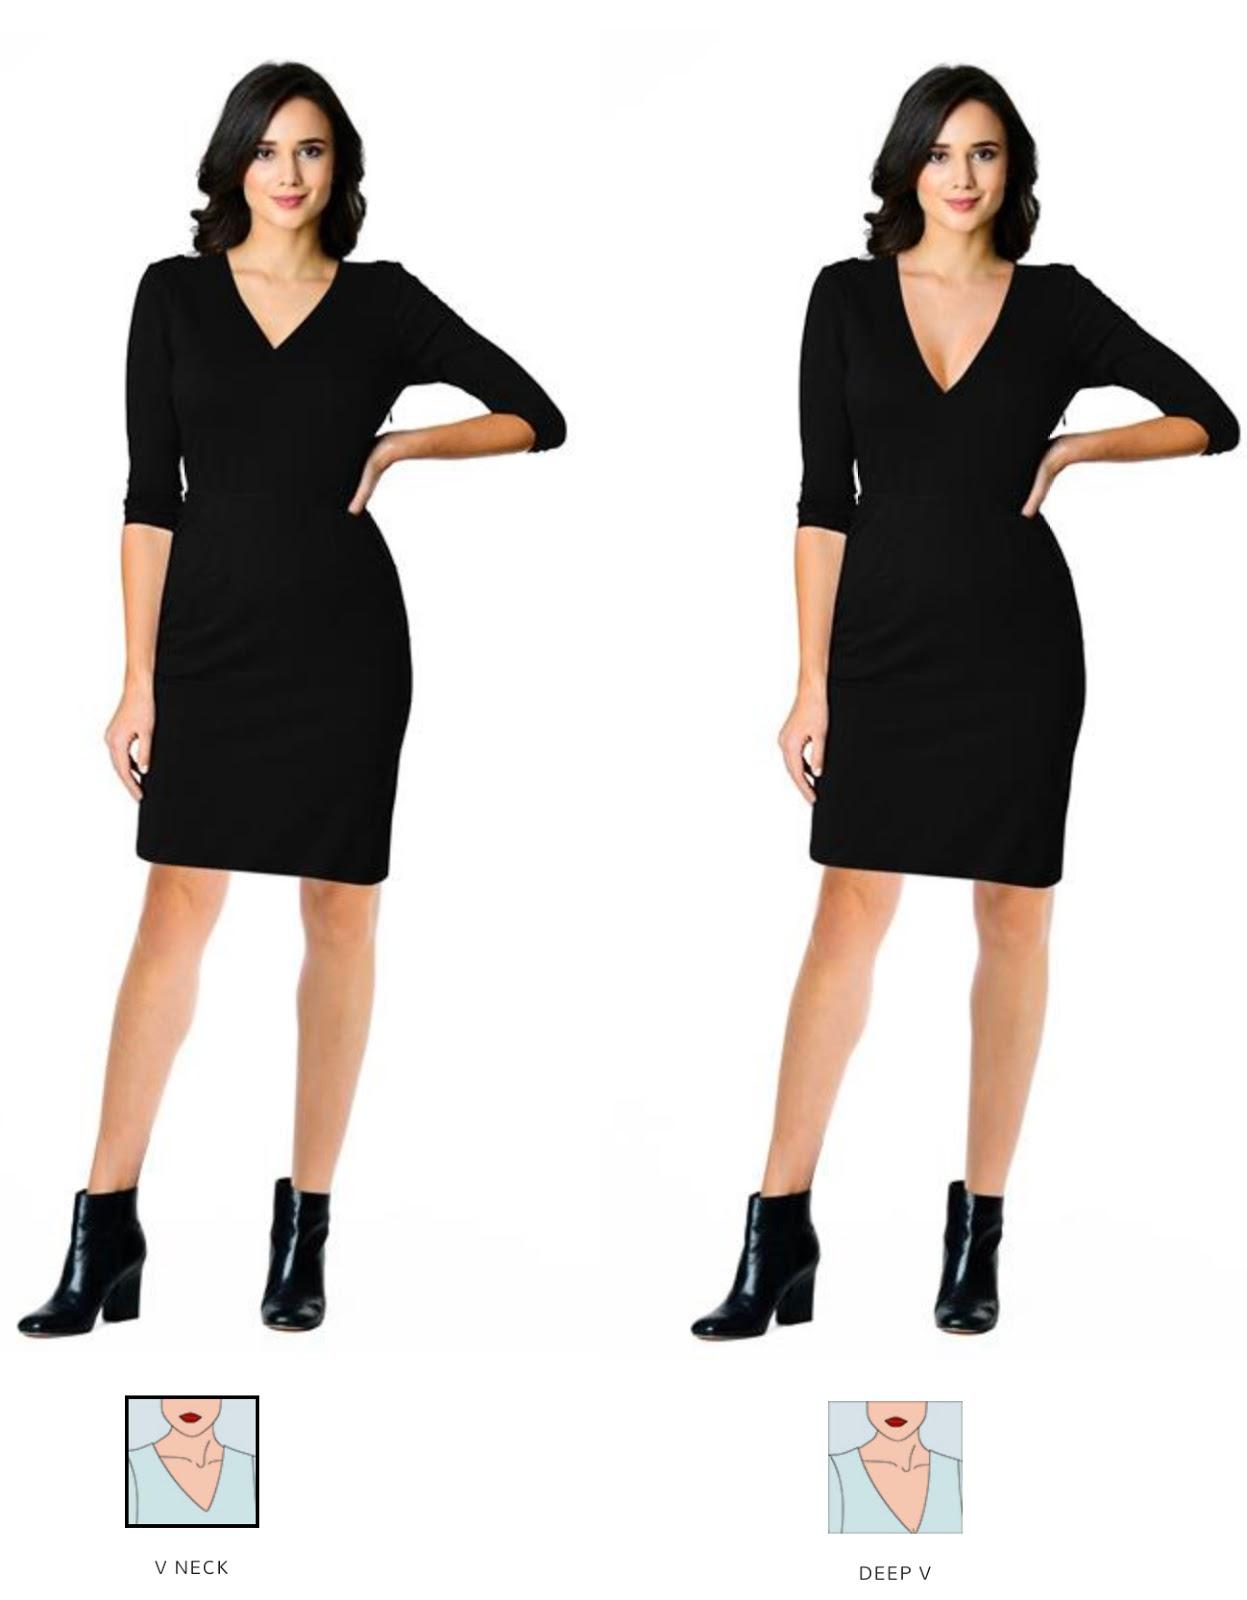 https://www.eshakti.com/shop/Dresses/Star-print-georgette-midi-wrap-dress-CL0051210